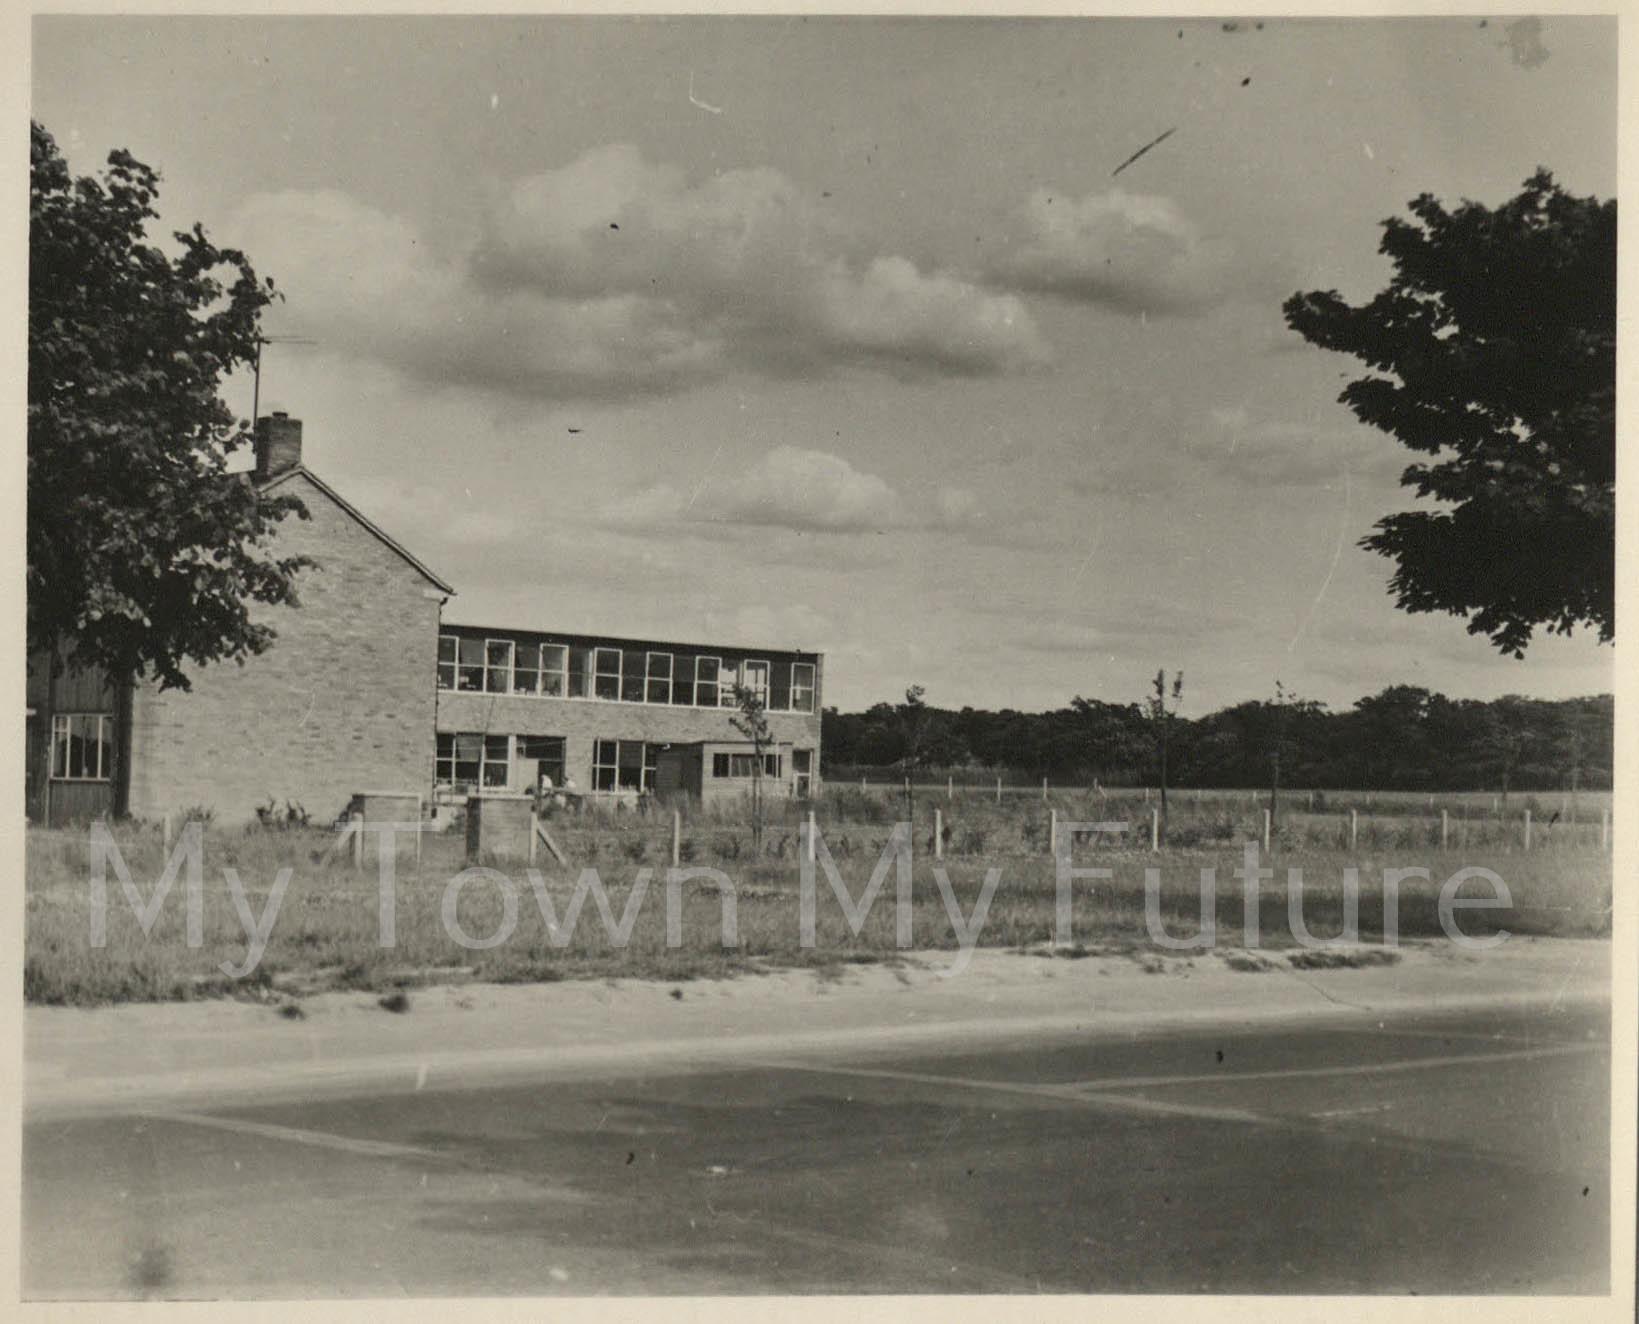 Prissick Base Middlesbrough High School